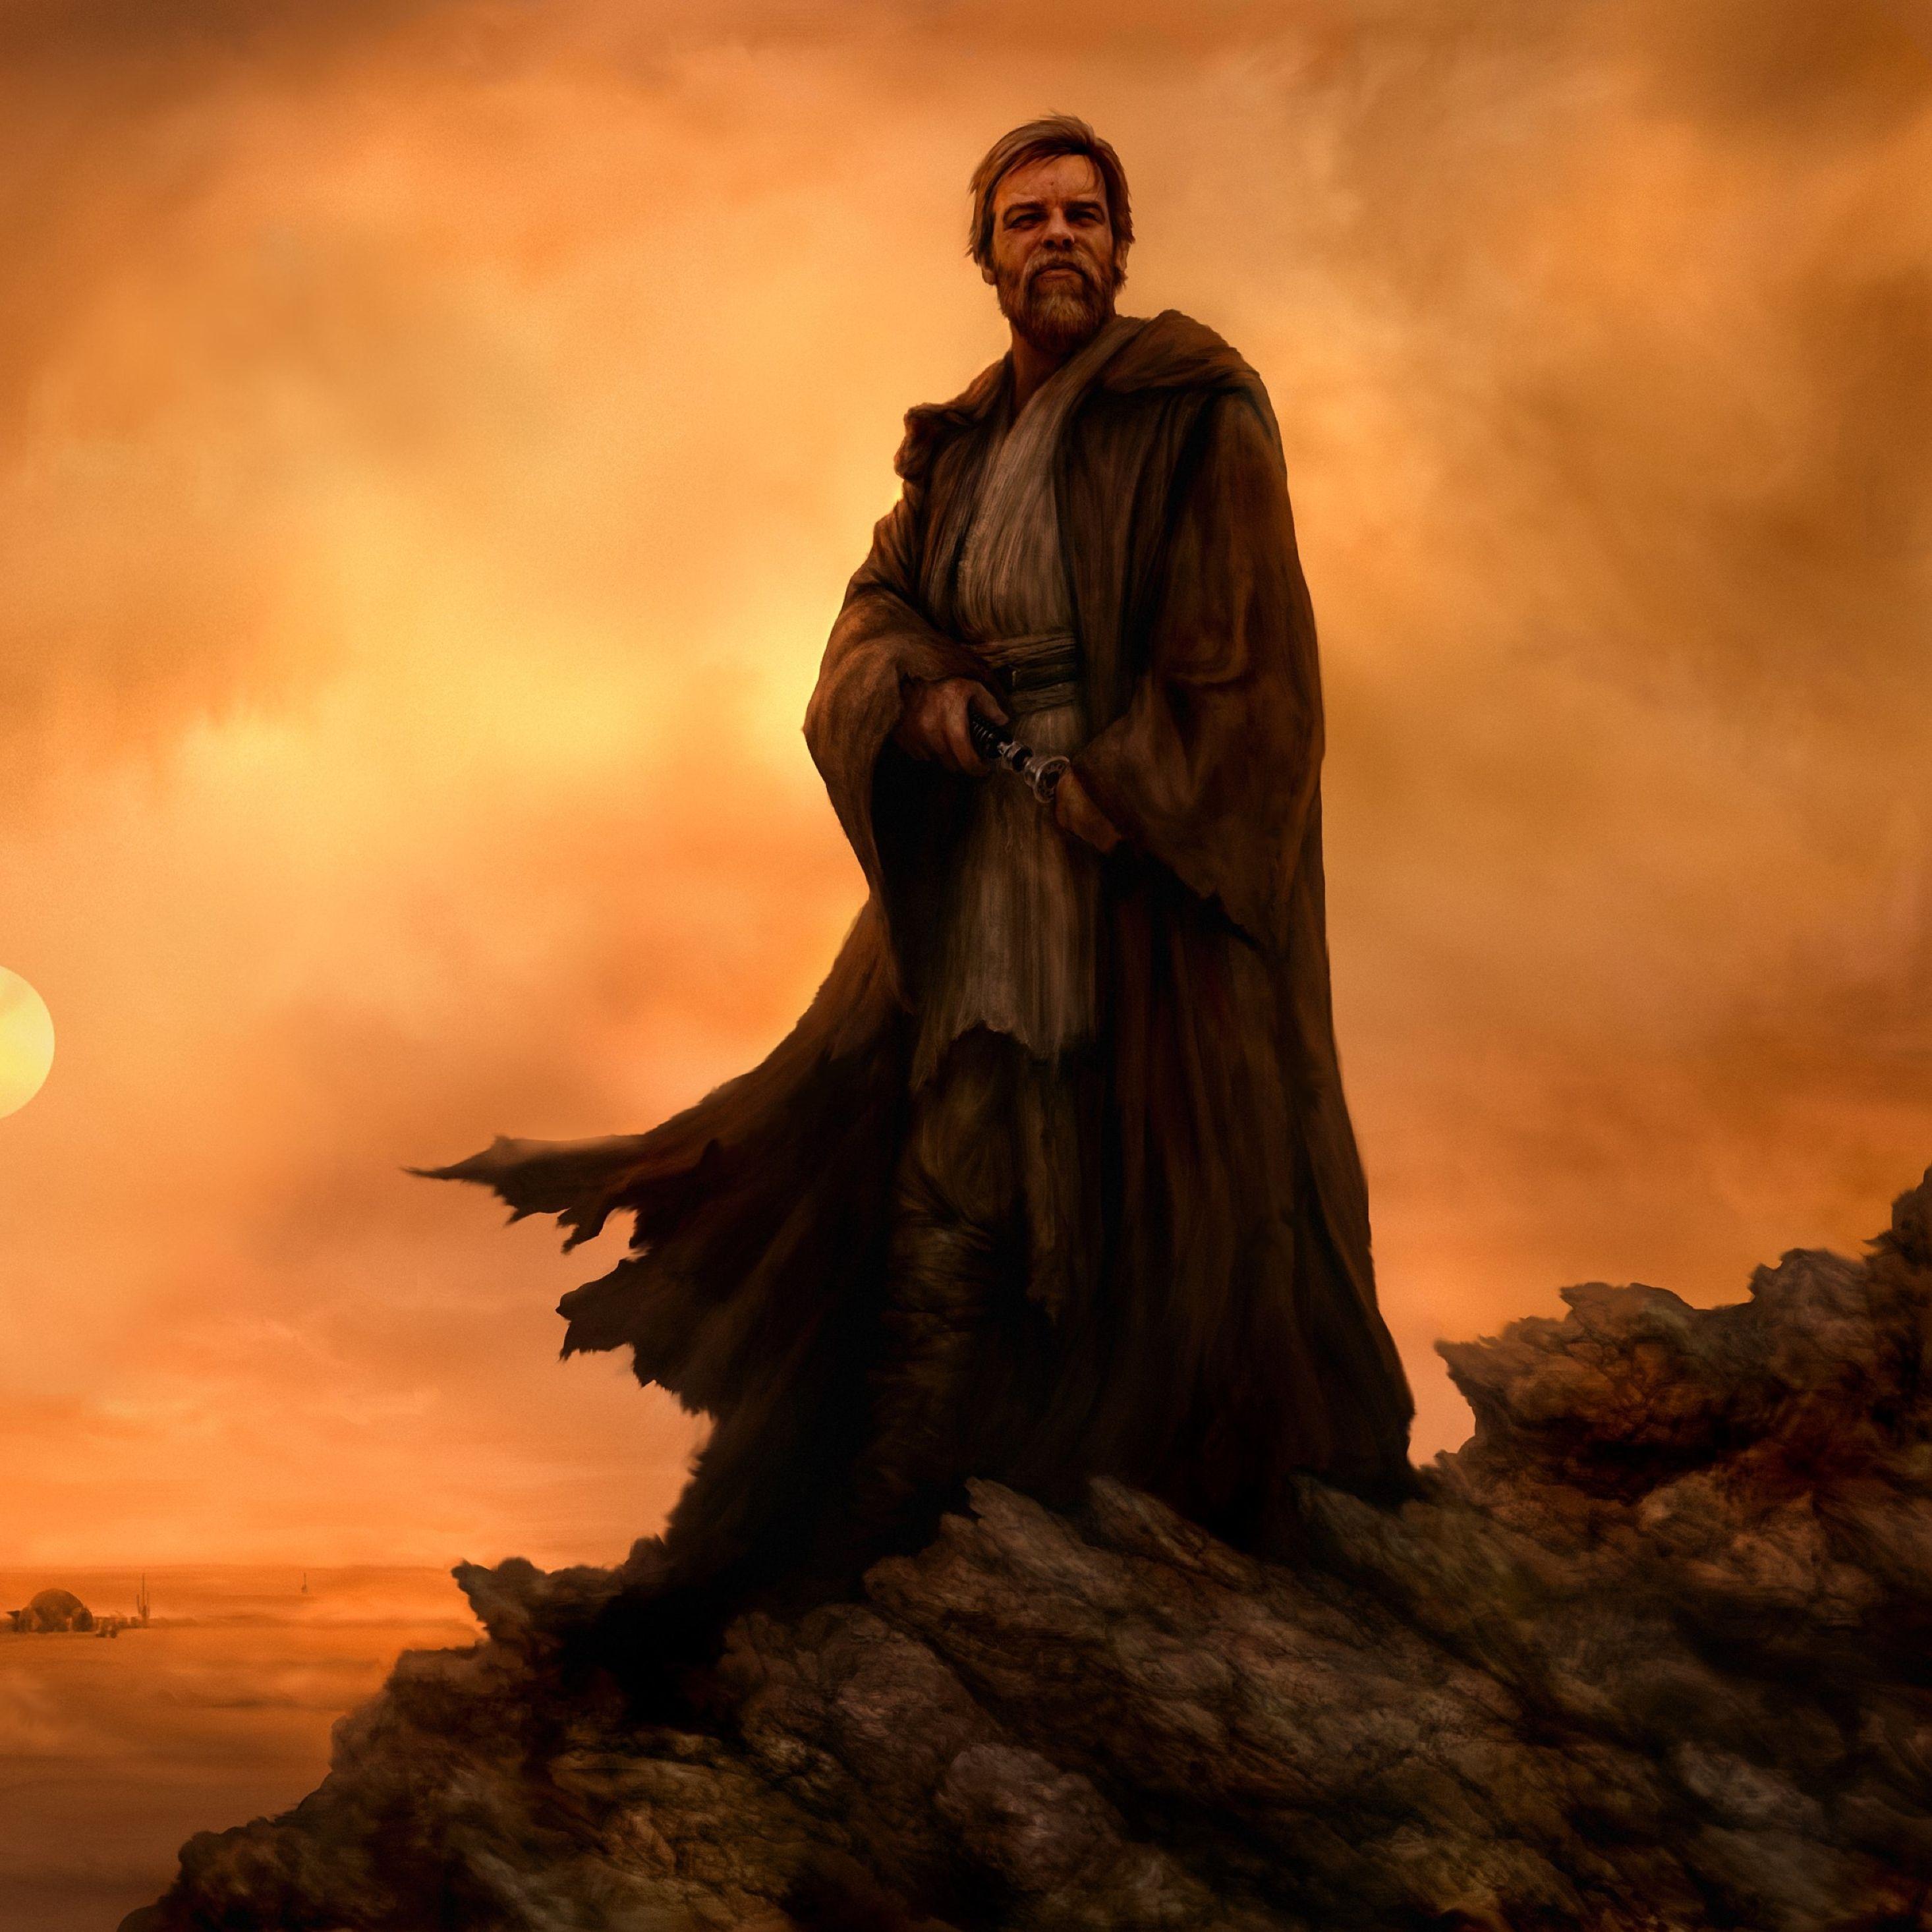 Star Wars Obi Wan Wallpapers Top Free Star Wars Obi Wan Backgrounds Wallpaperaccess